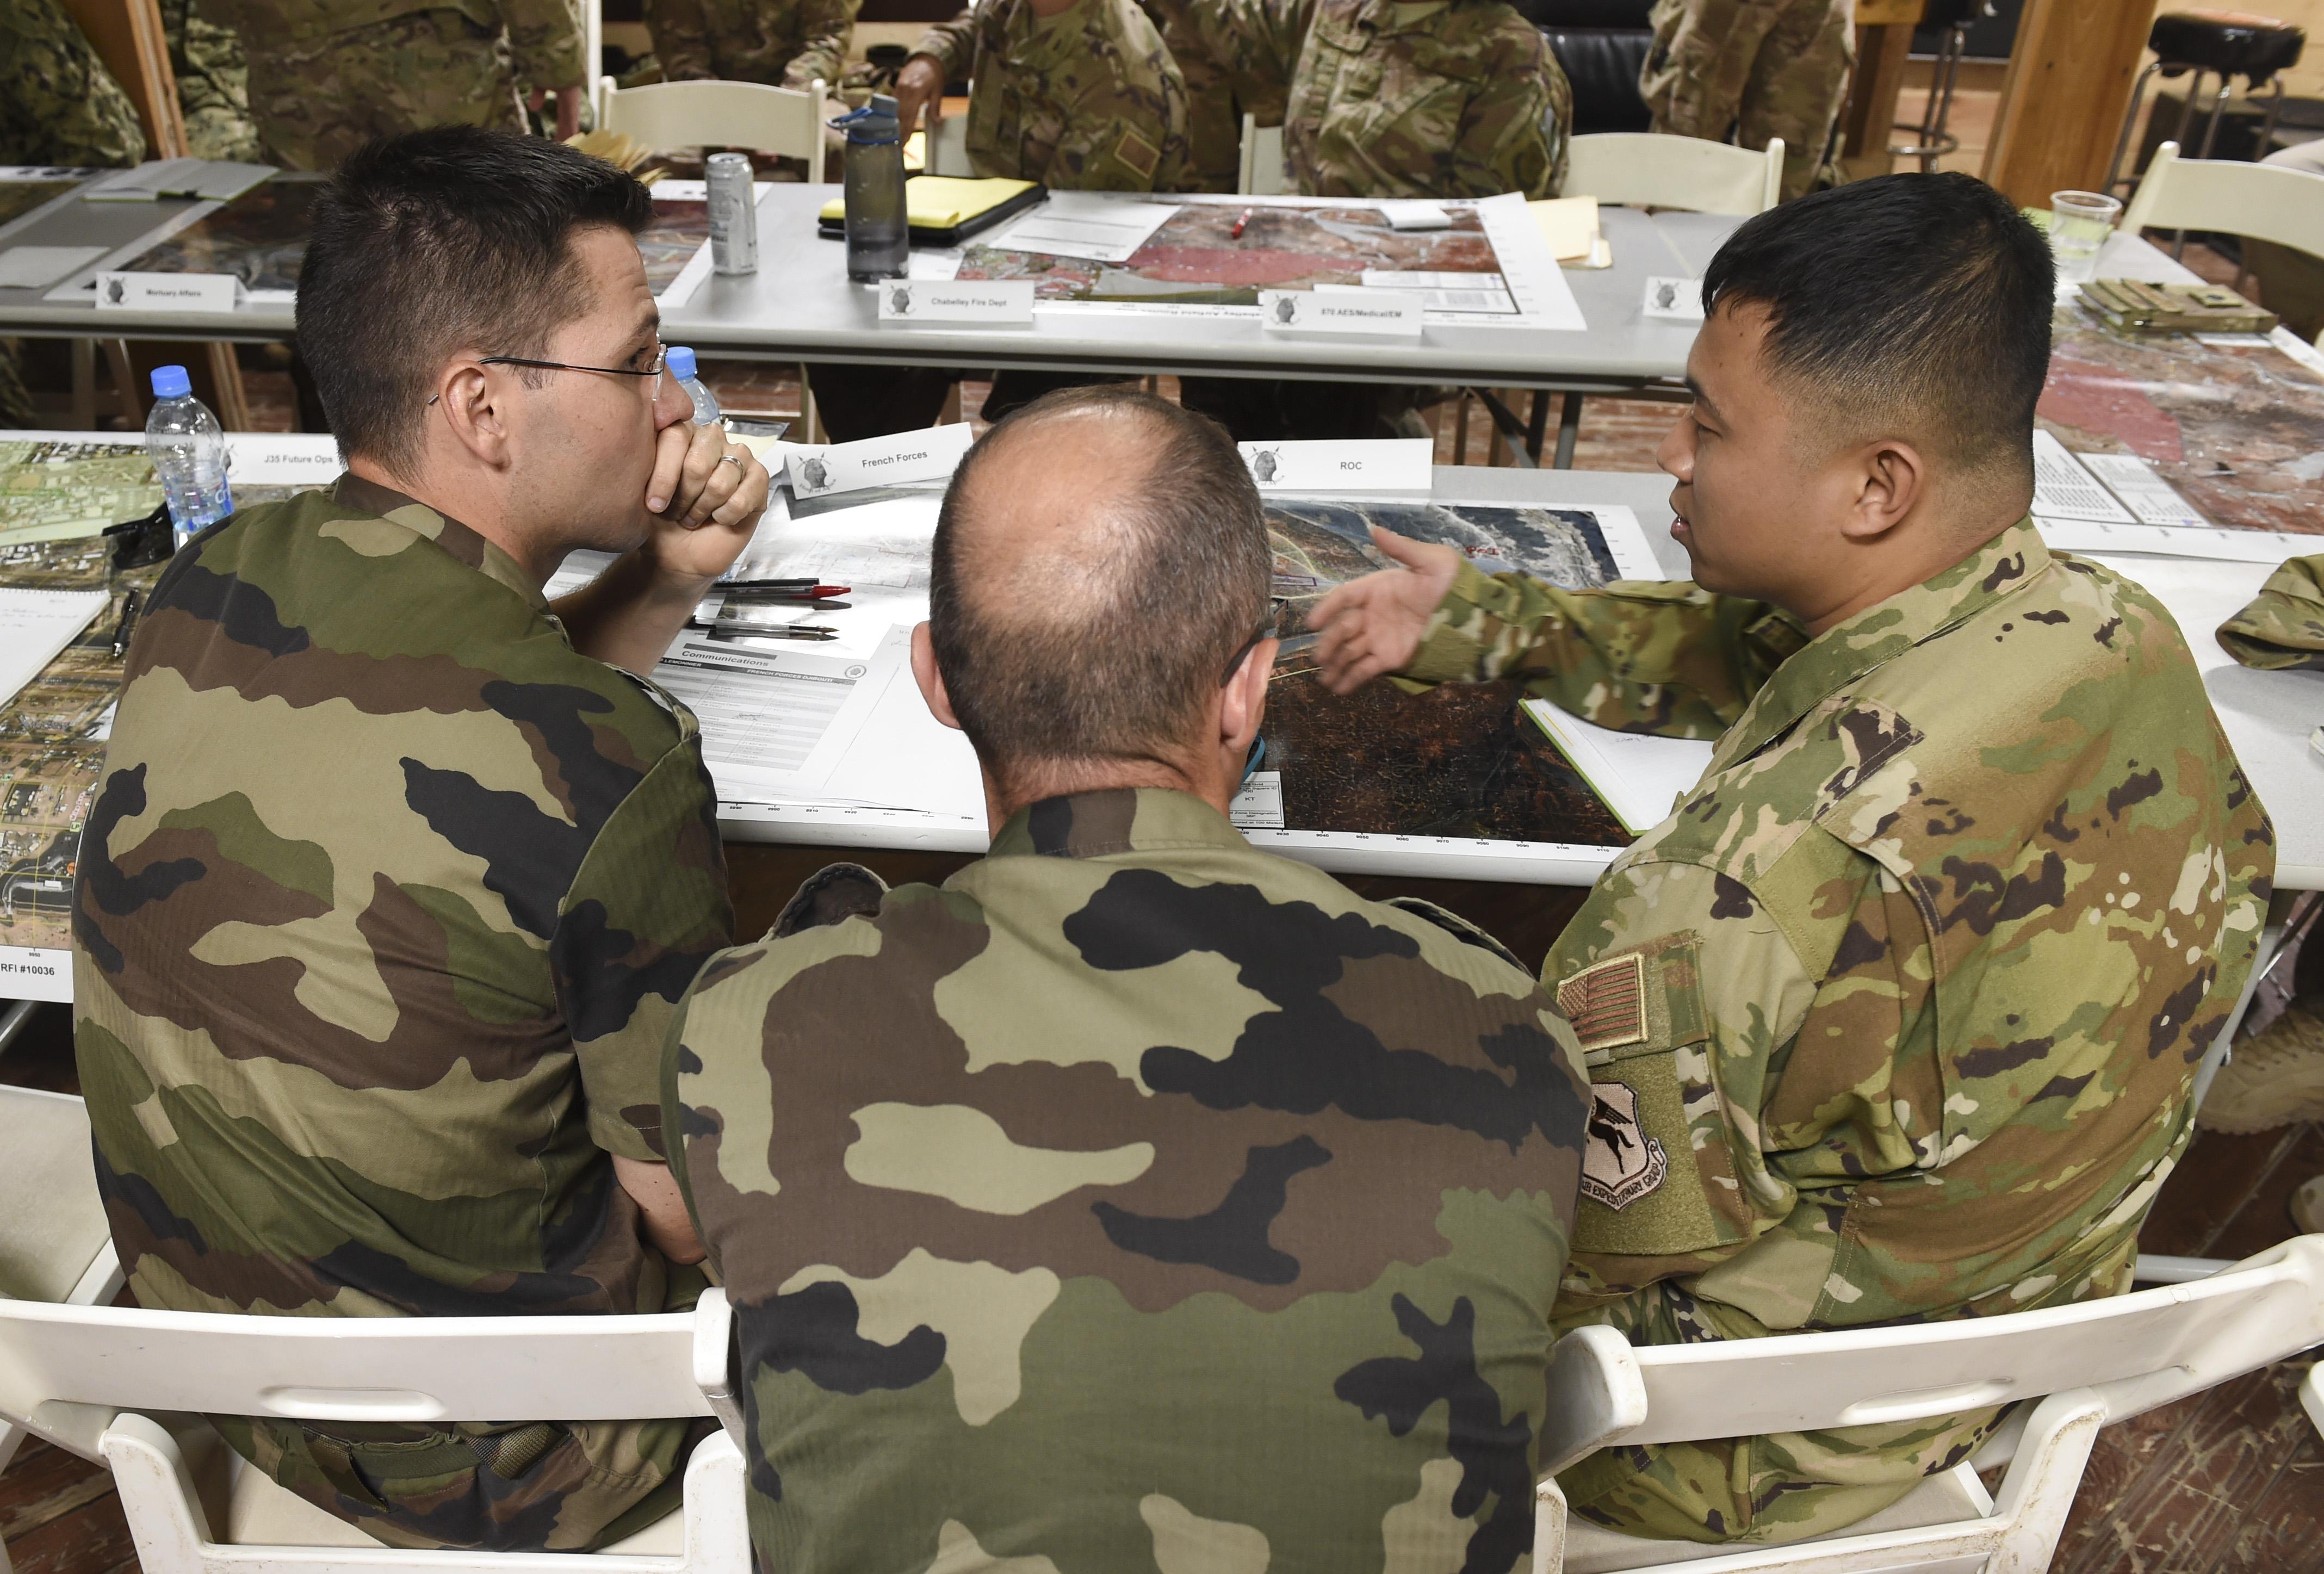 Camp Lemonnier Personnel Exercise Mass Casualty Response Procedure